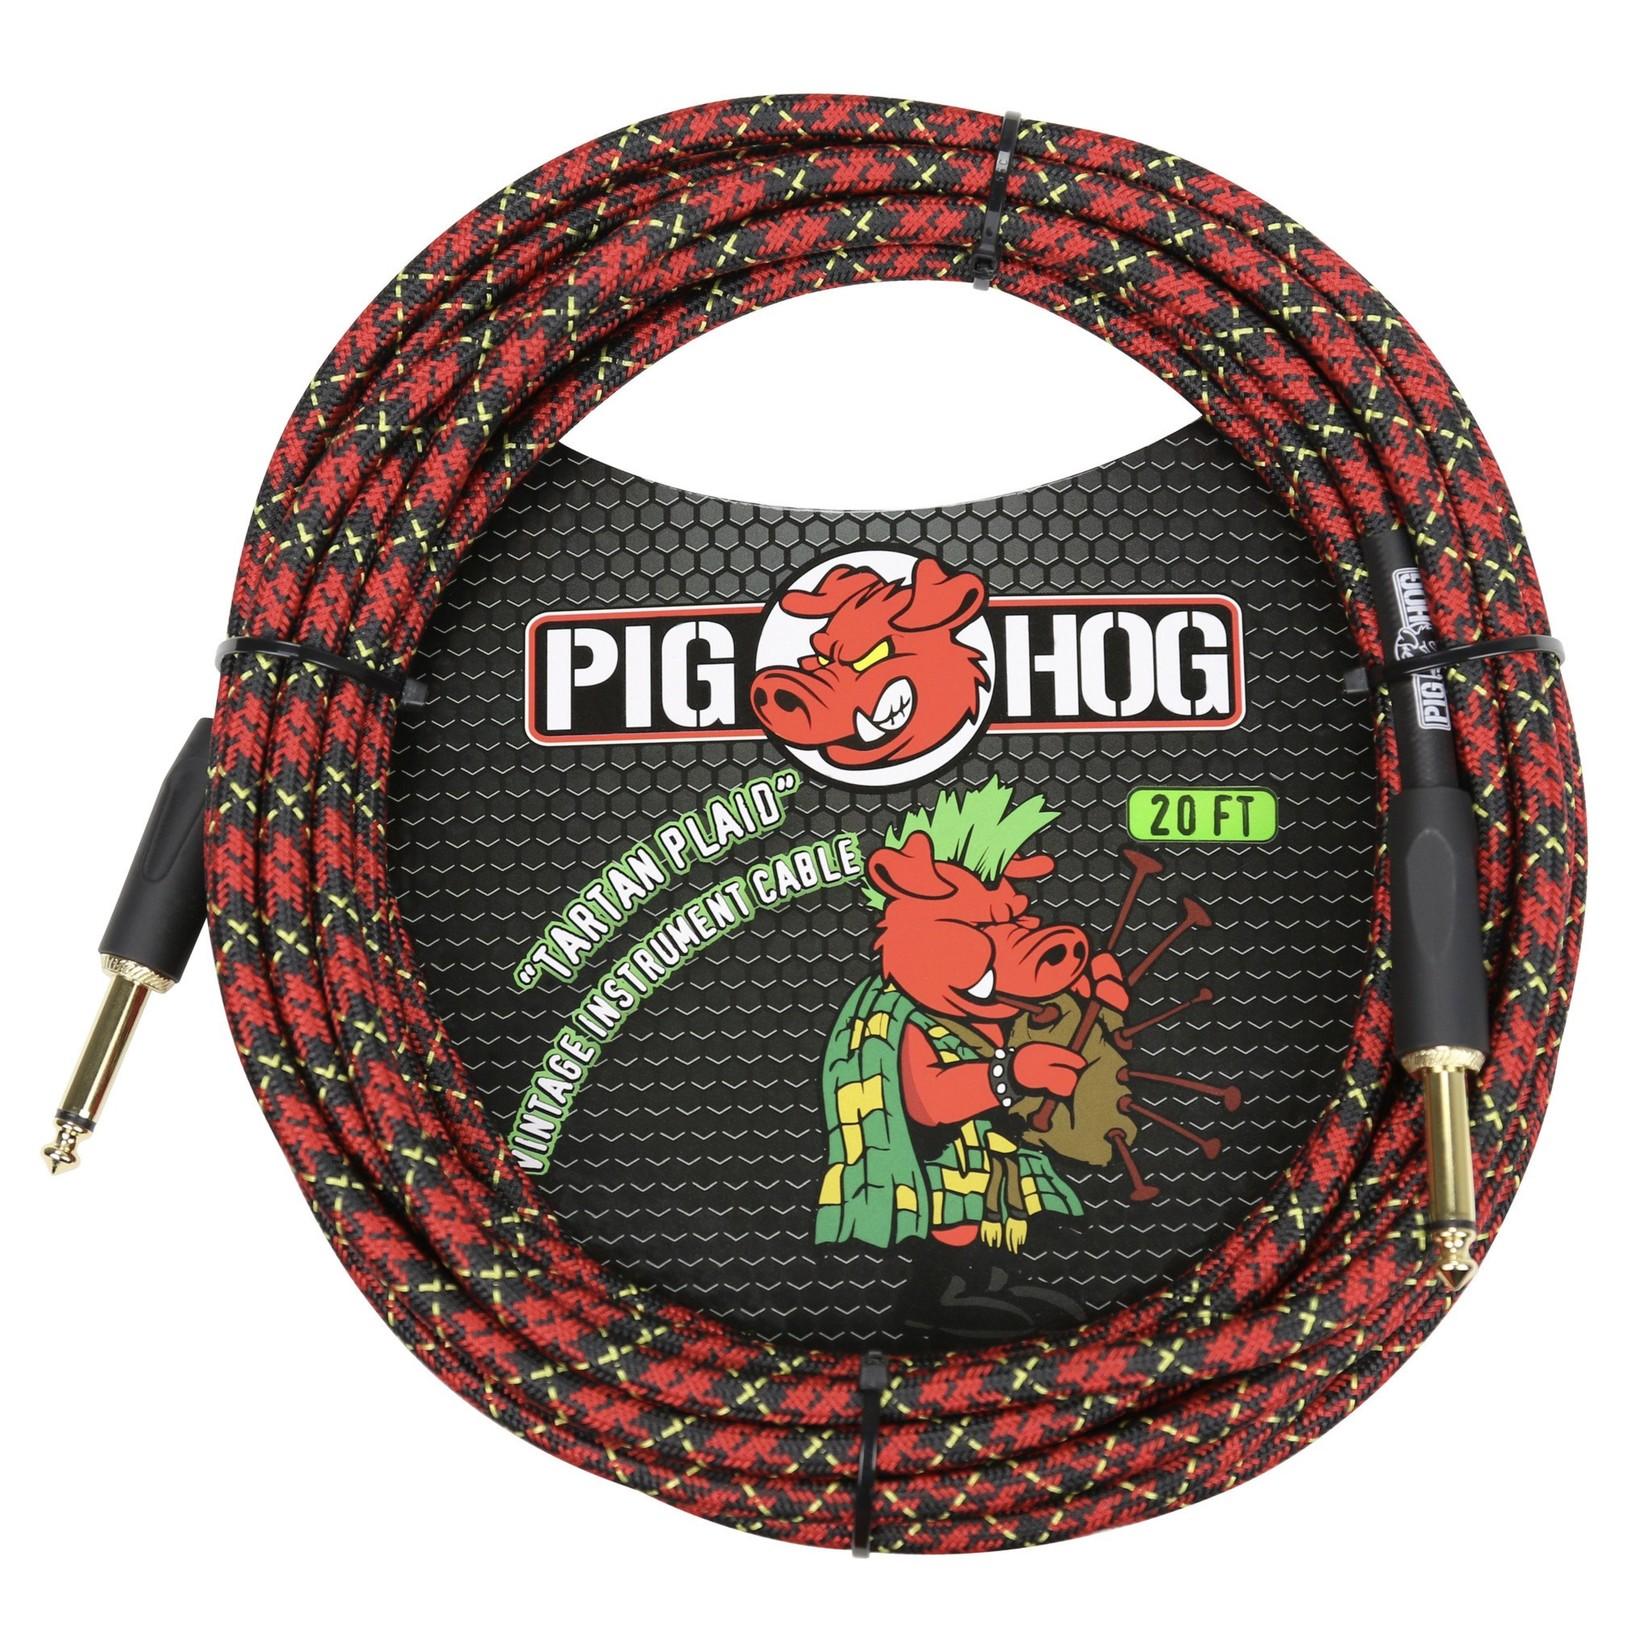 "Pig Hog Pig Hog ""Tartan Plaid"" Vintage Woven Instrument Cable, 20 Ft - 1/4"" Straight Plugs"